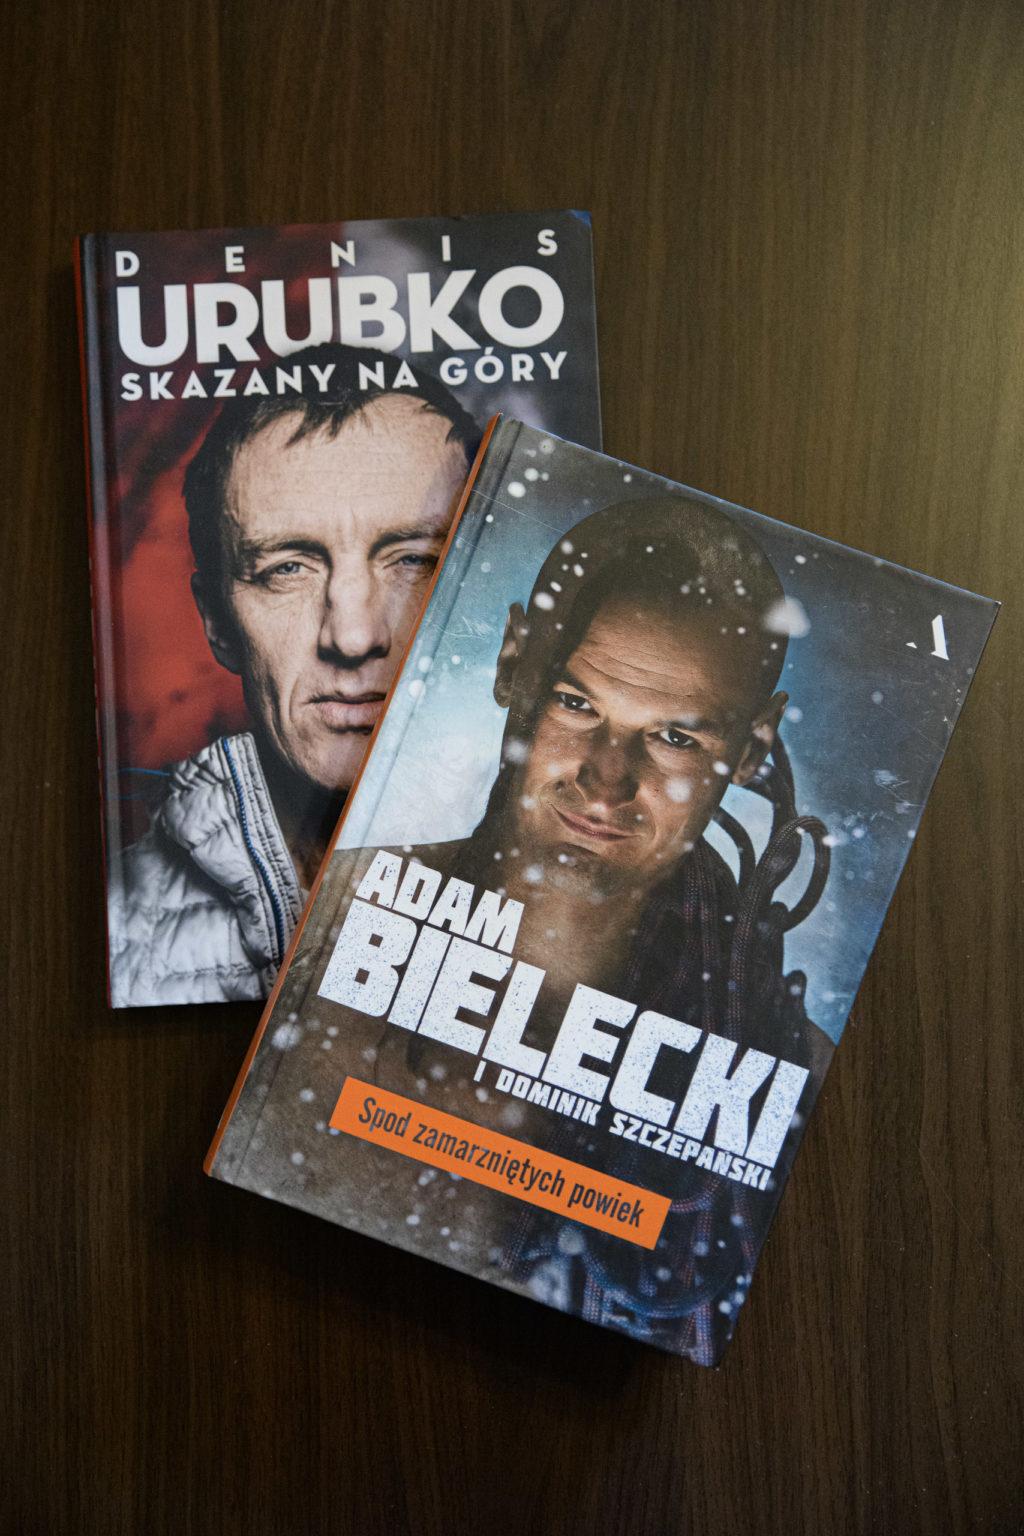 Biografie Adama Bieleckiego i Denisa Urubki – literatura górska Agory